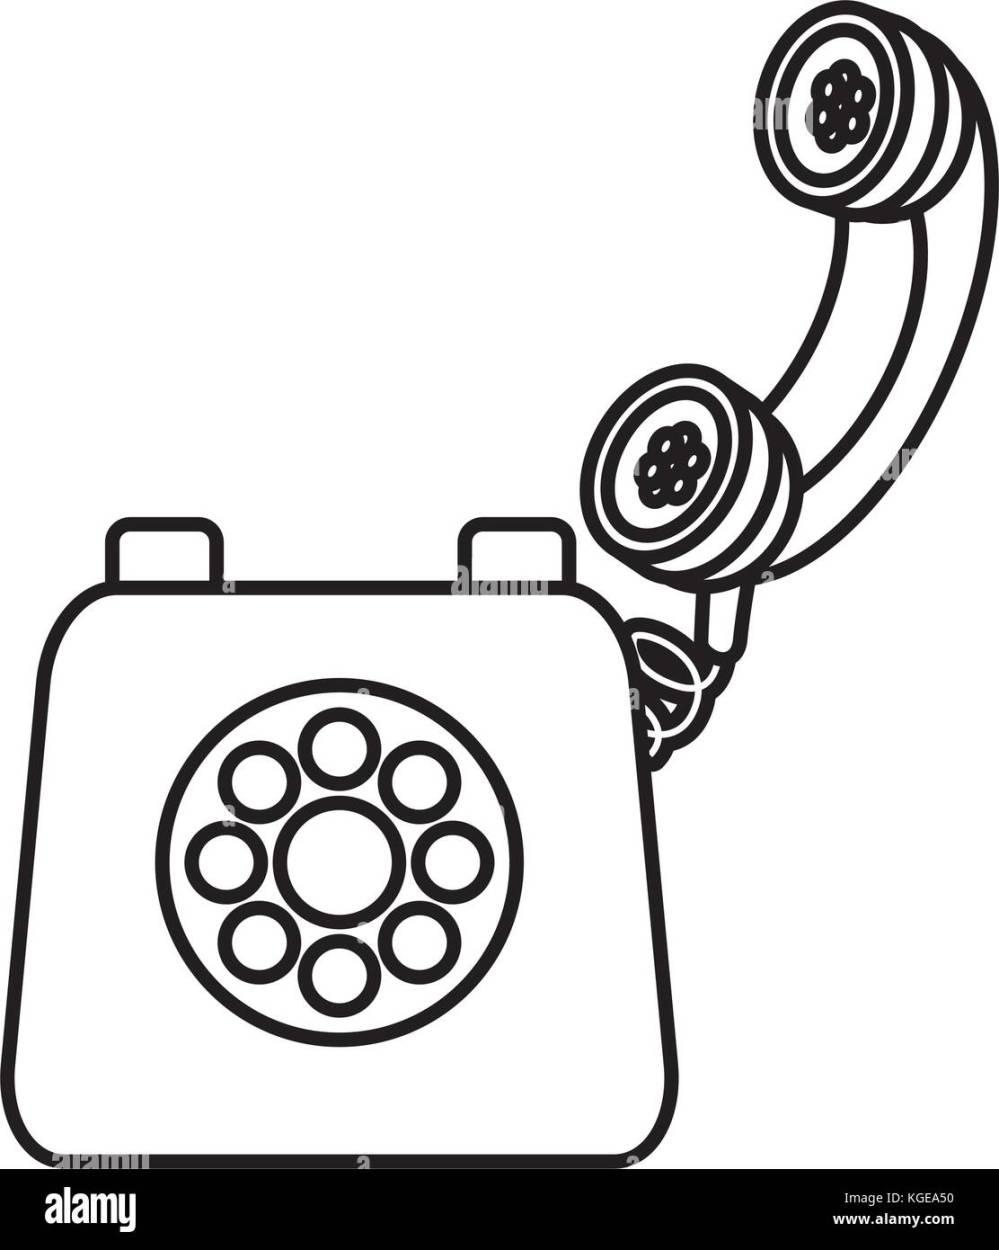 medium resolution of old telephone isolated